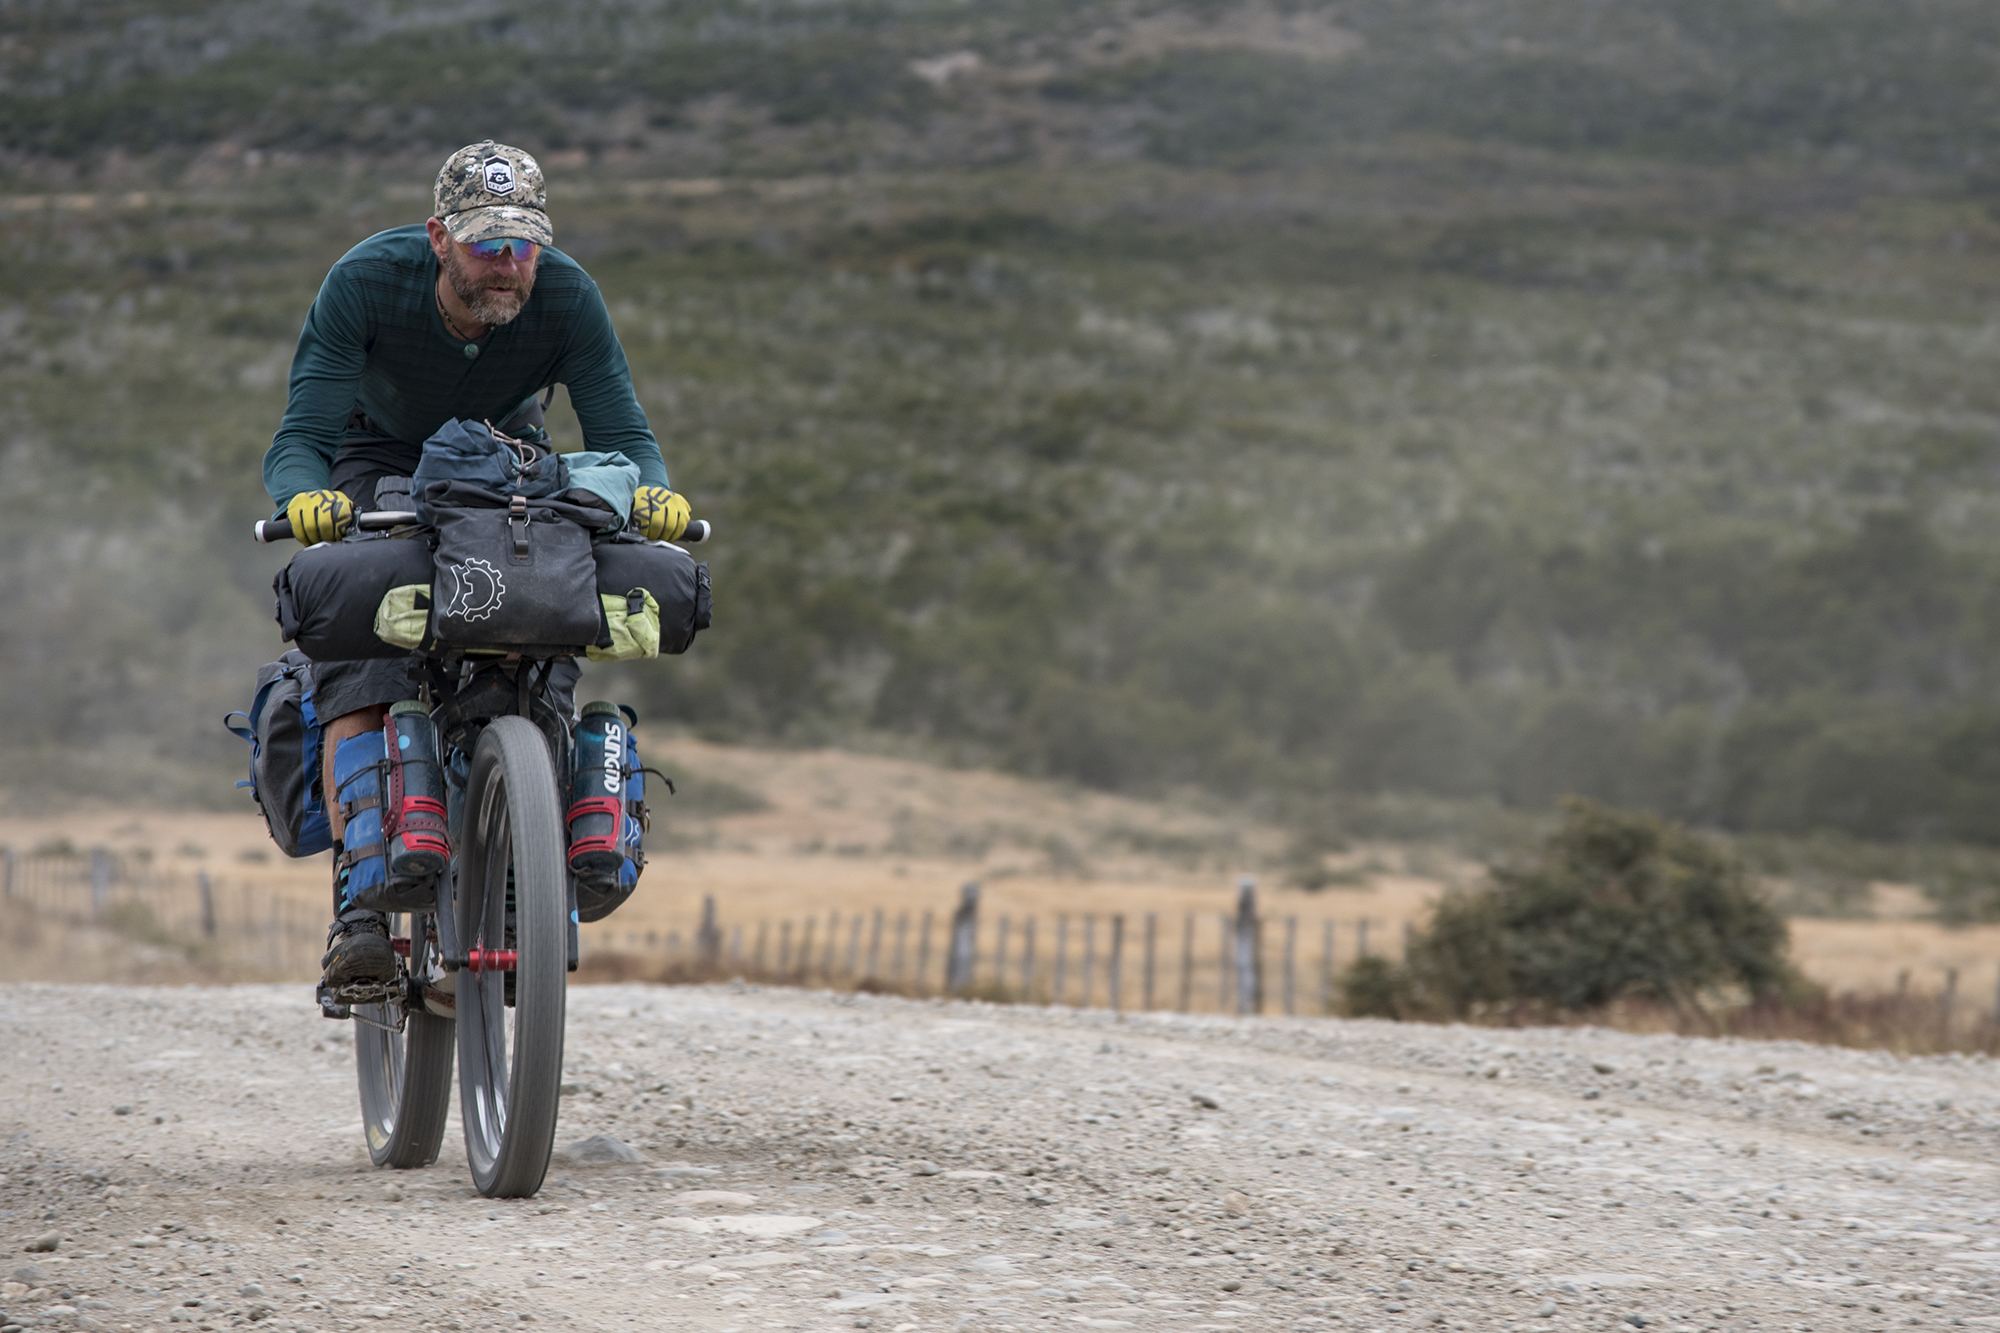 goteras de la patagonia photos bikepacking